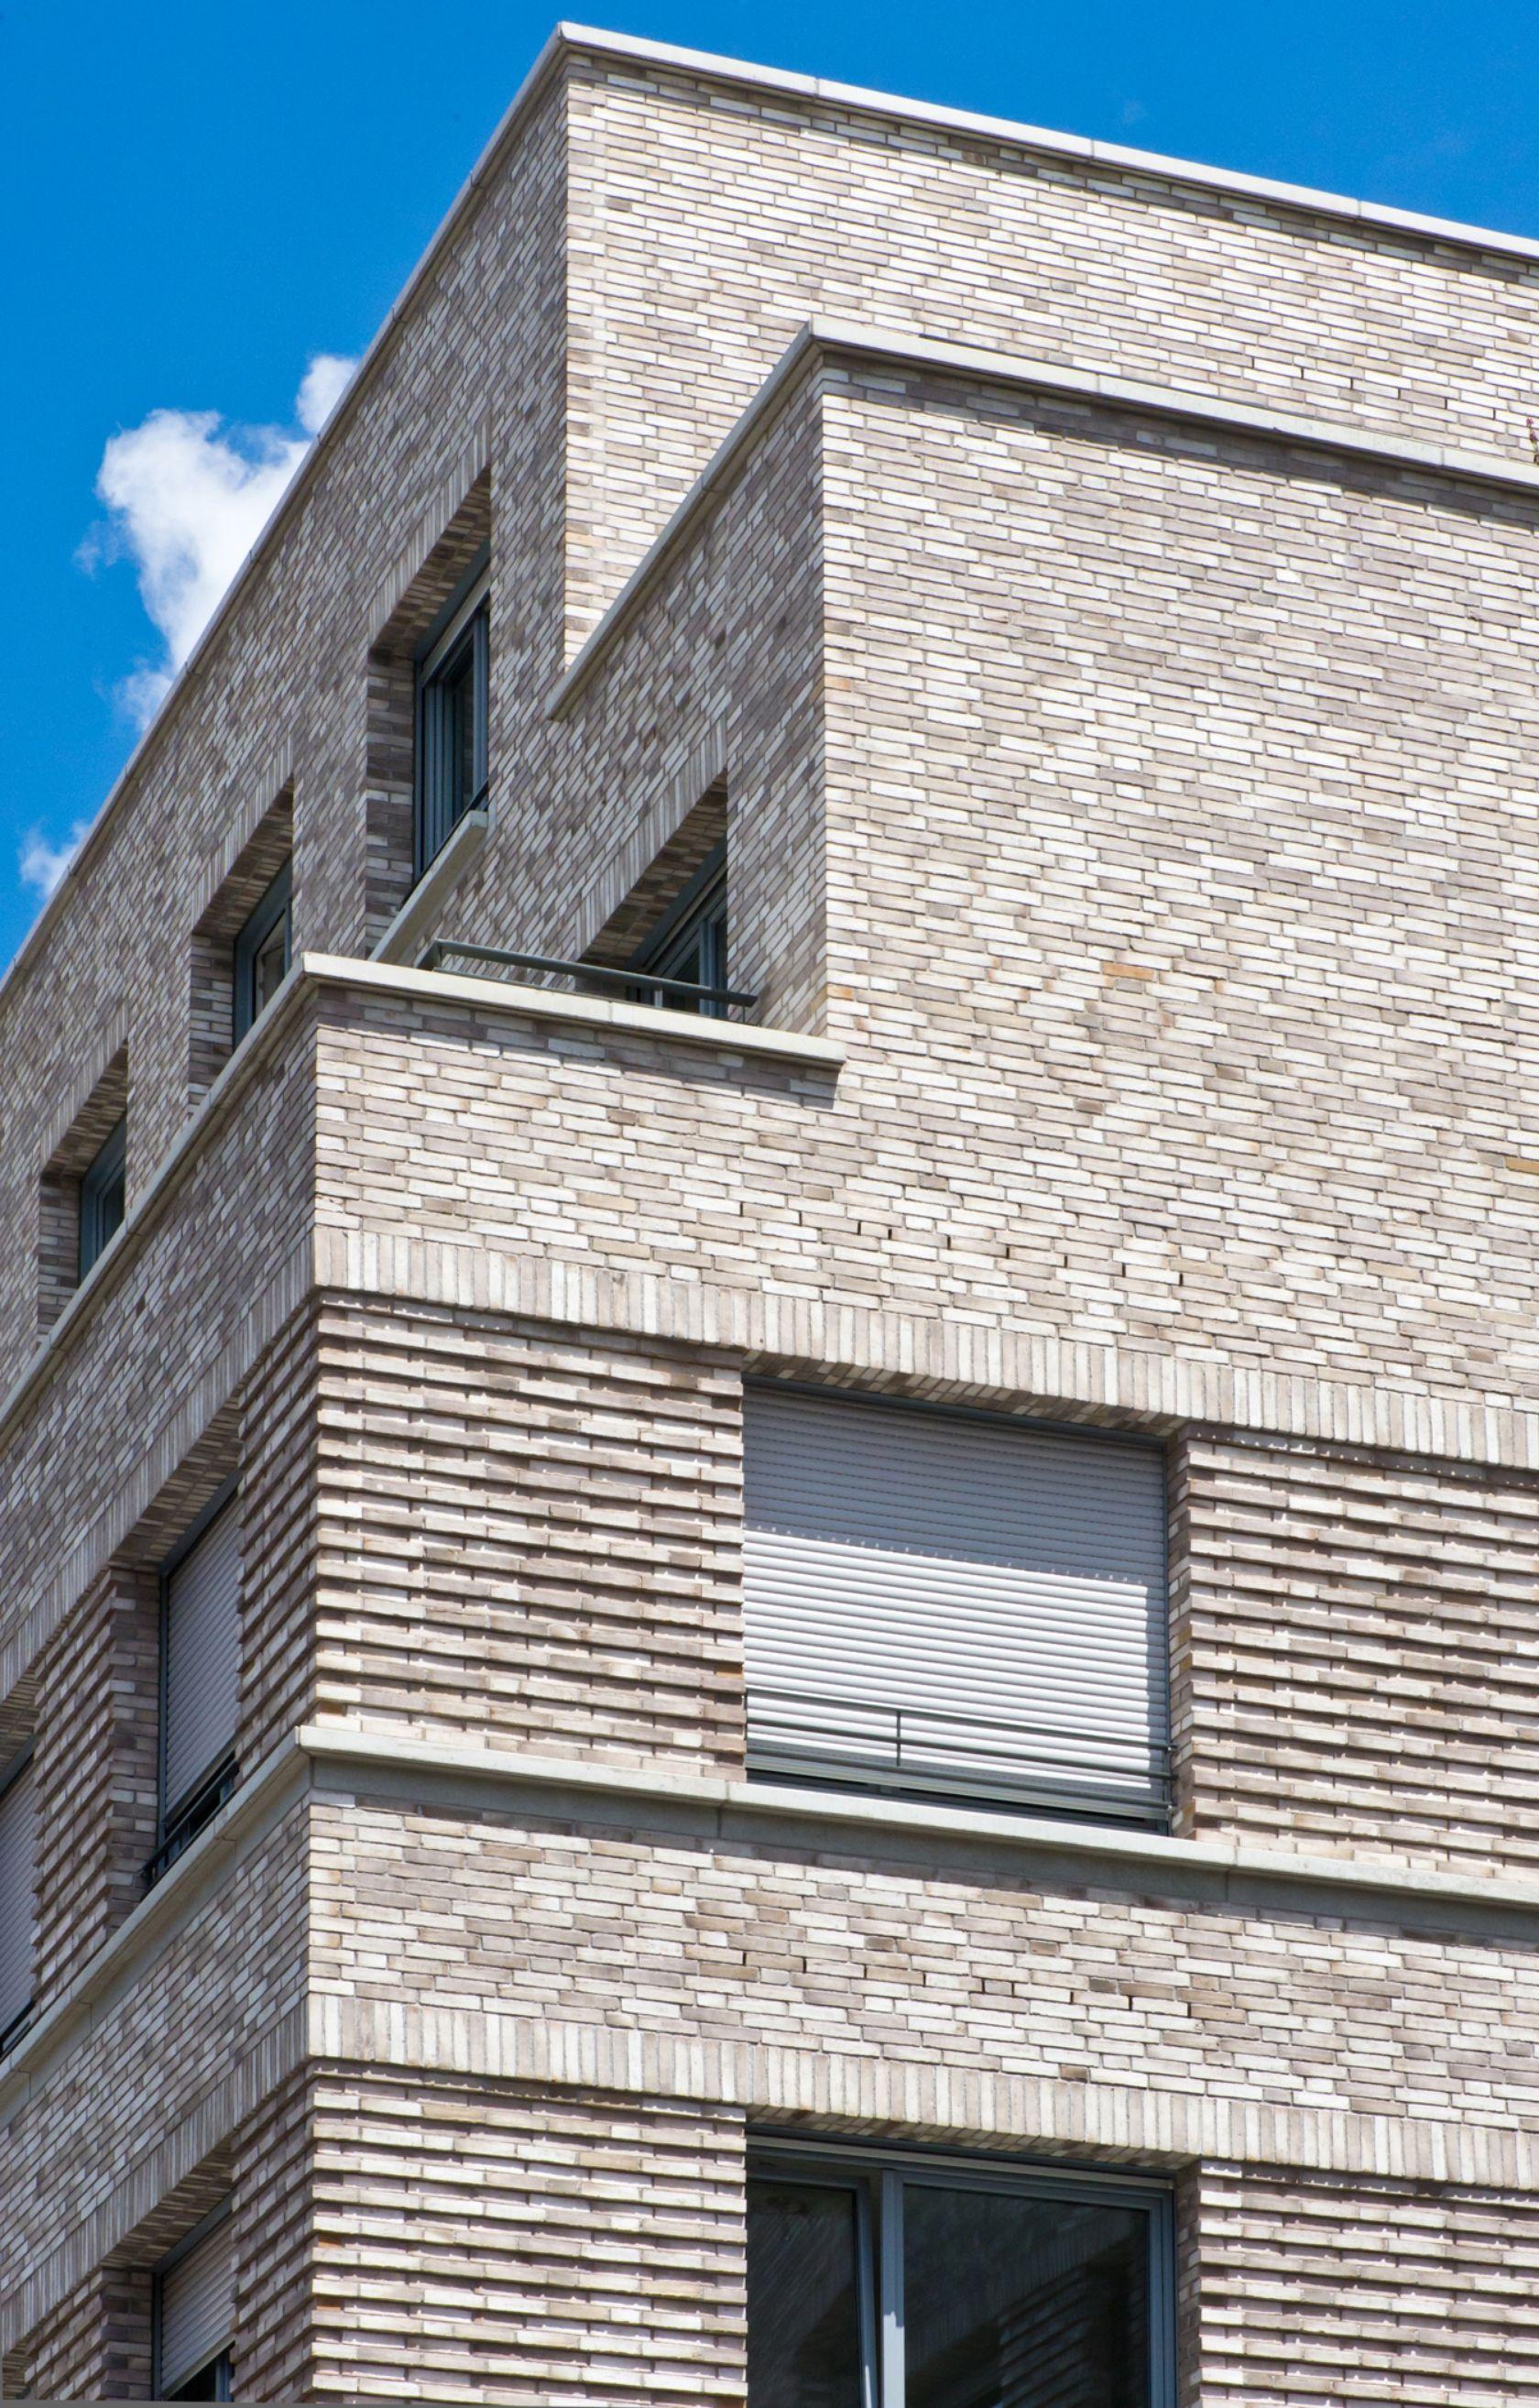 Architekten In Mannheim residential and commercial building r7 stefan forster